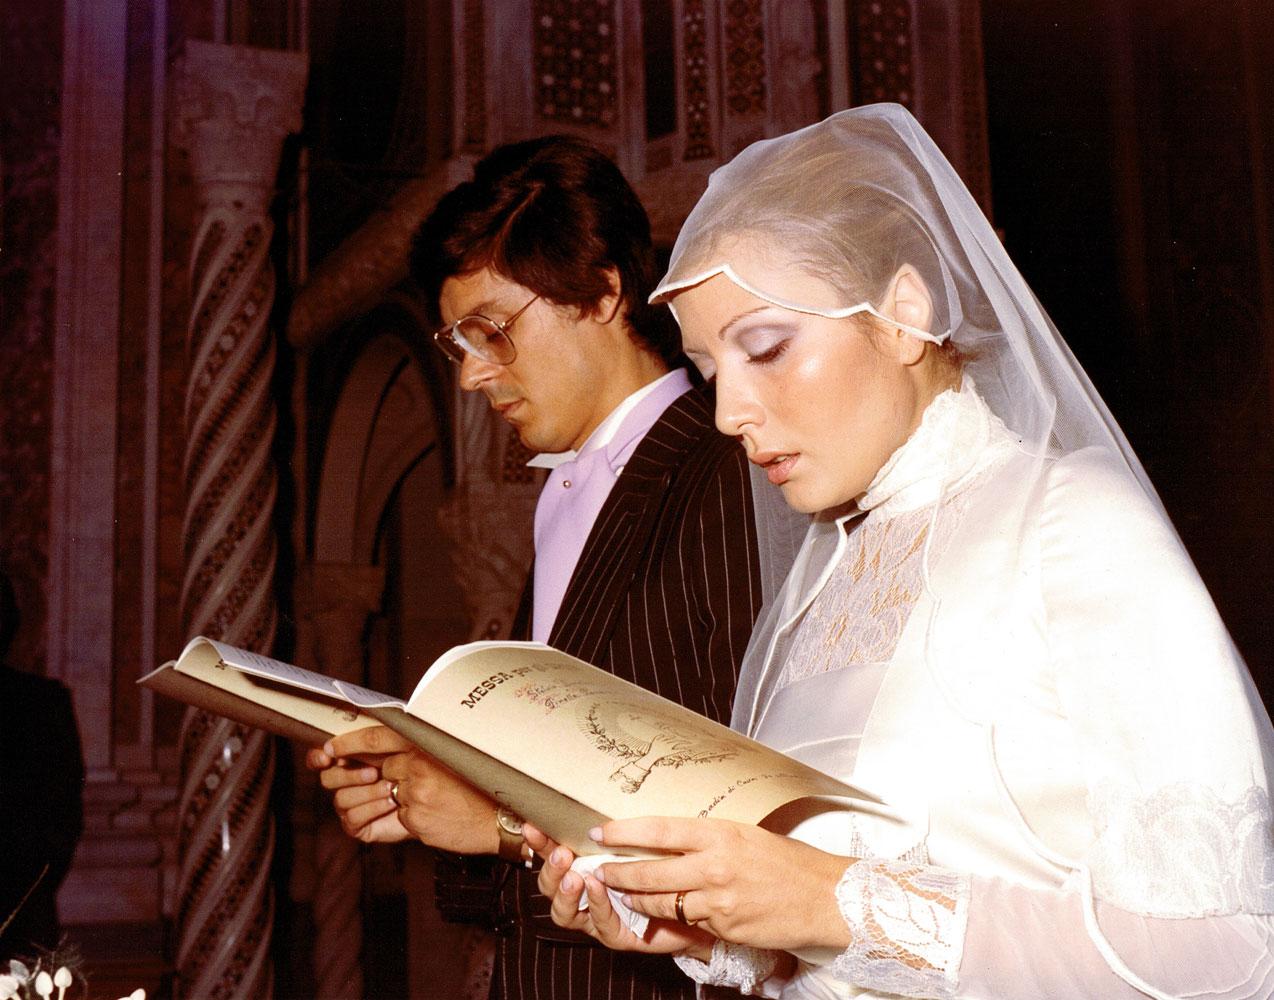 Pinella-Passaro-anniversario-matrimonio-40-anni